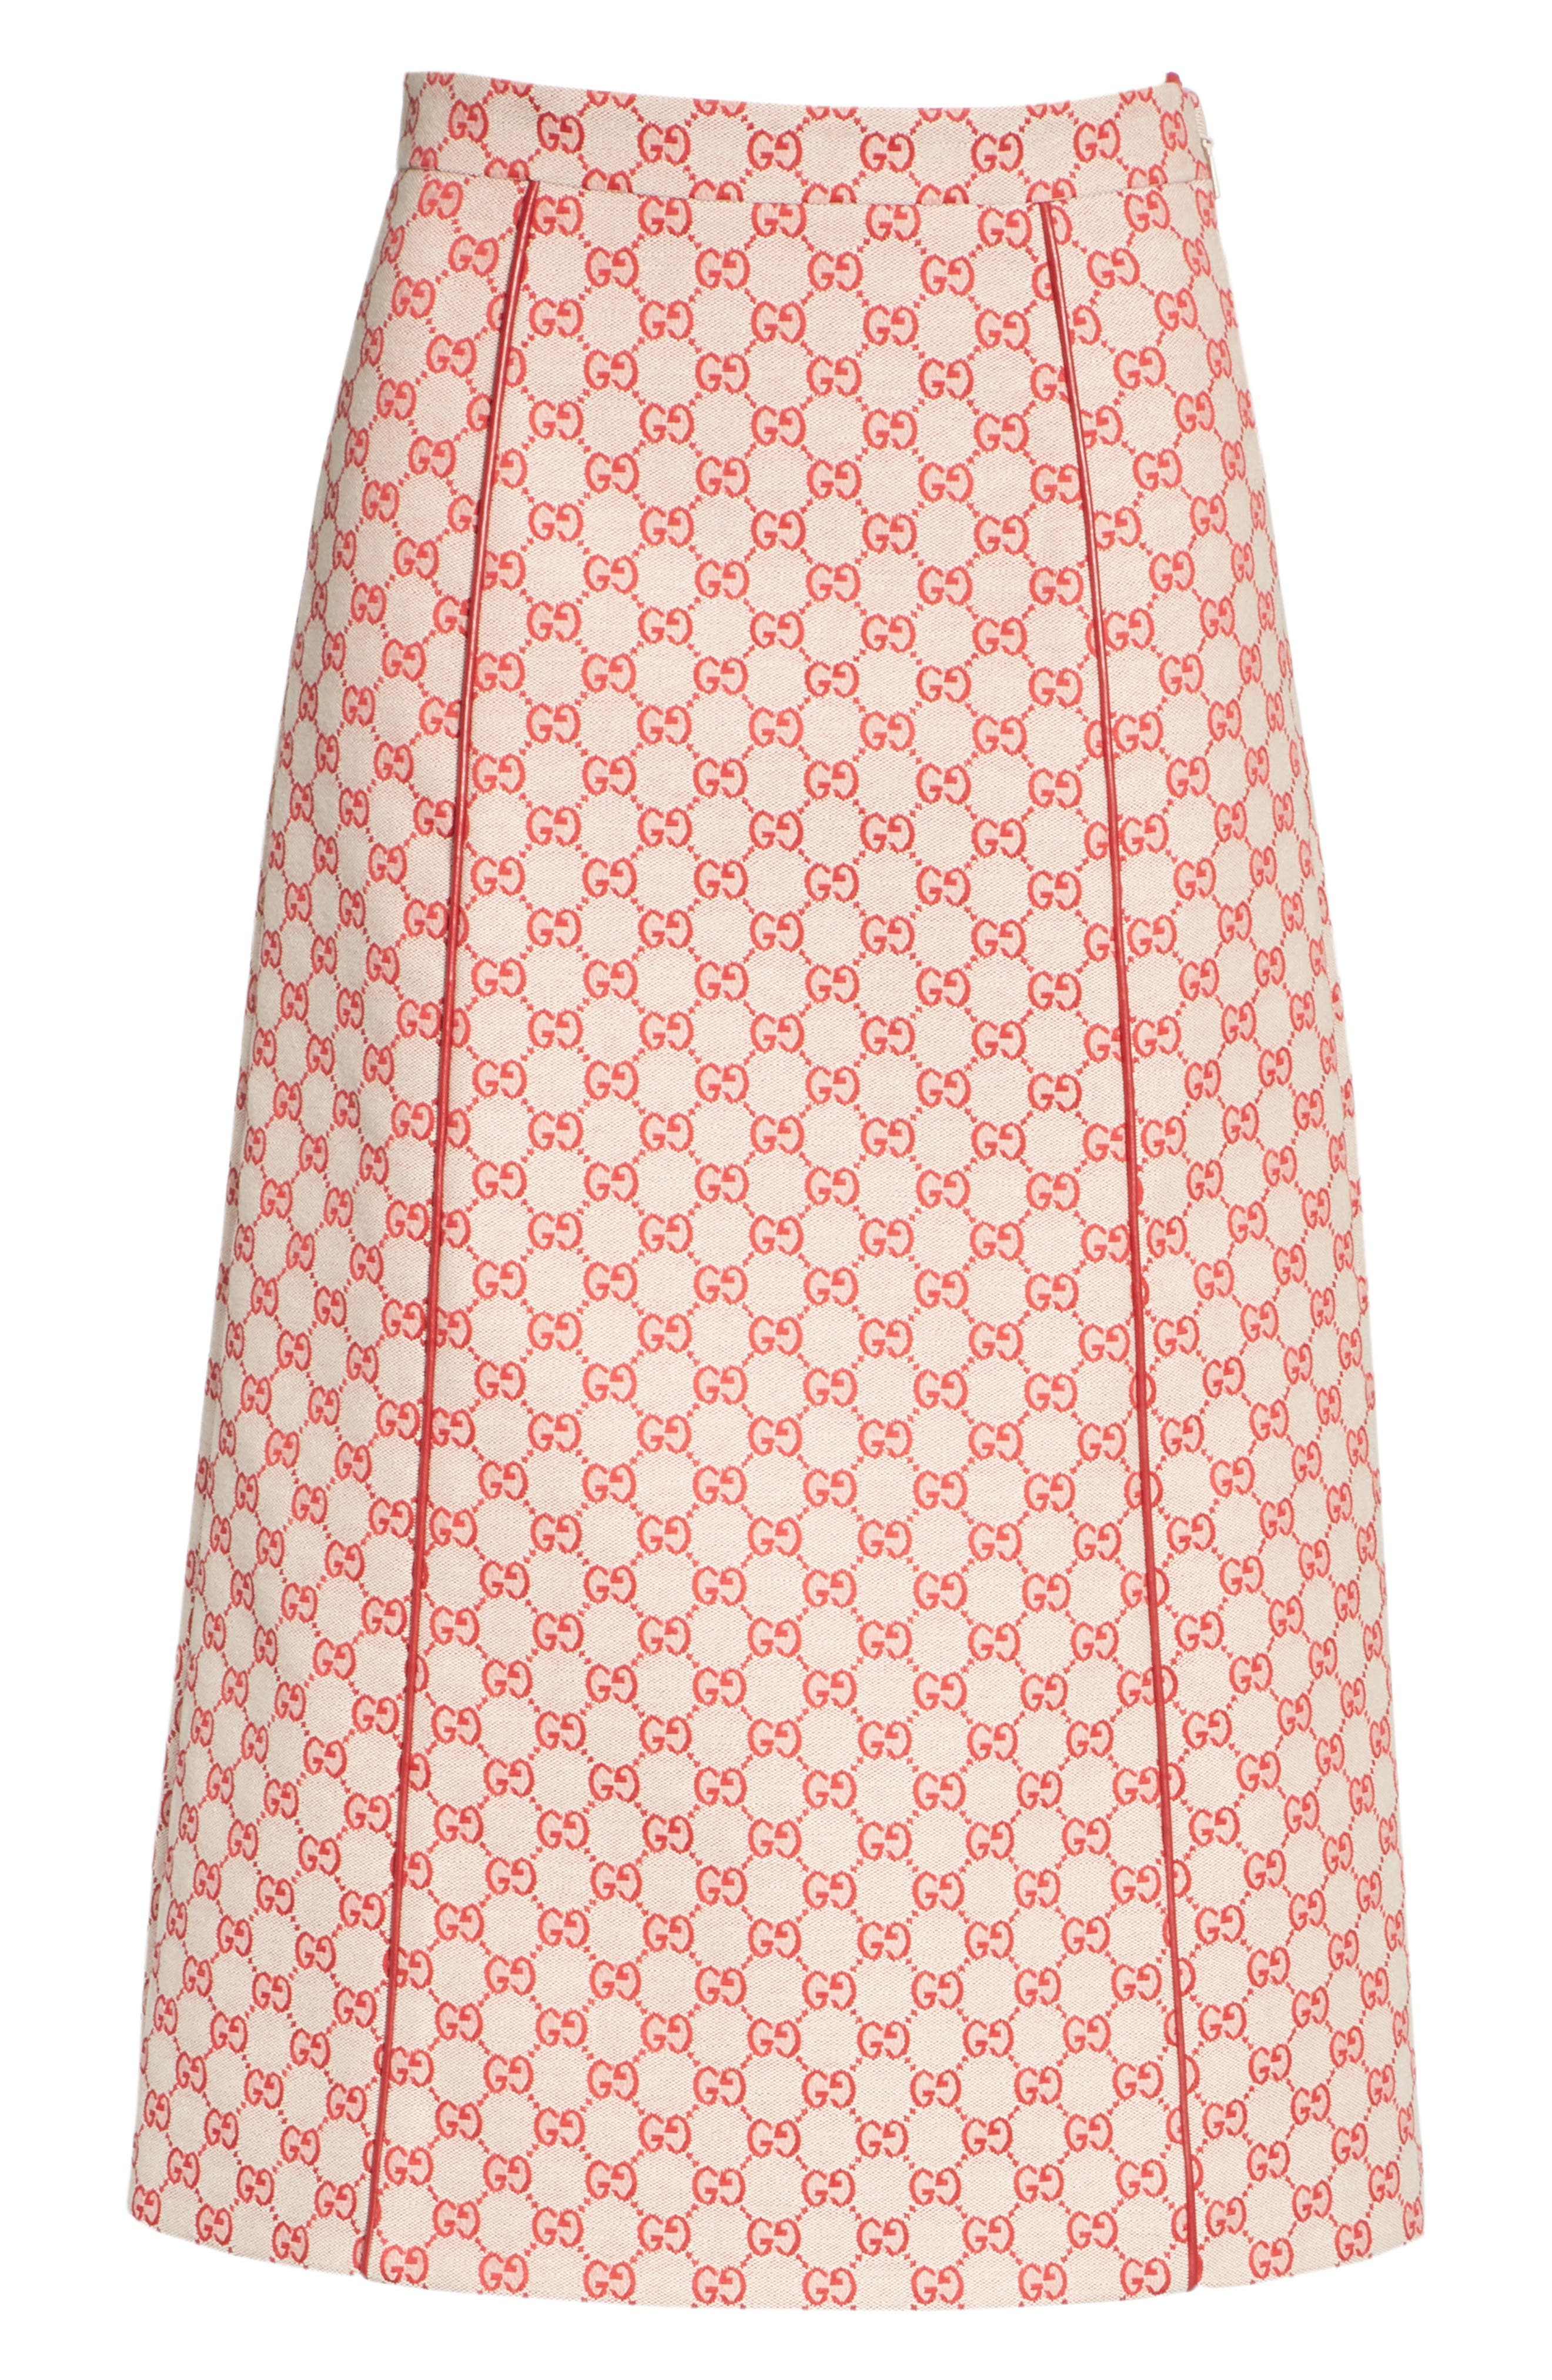 GG Print Canvas A-Line Skirt,                             Alternate thumbnail 6, color,                             GARDENIA/ HIBISCUS RED